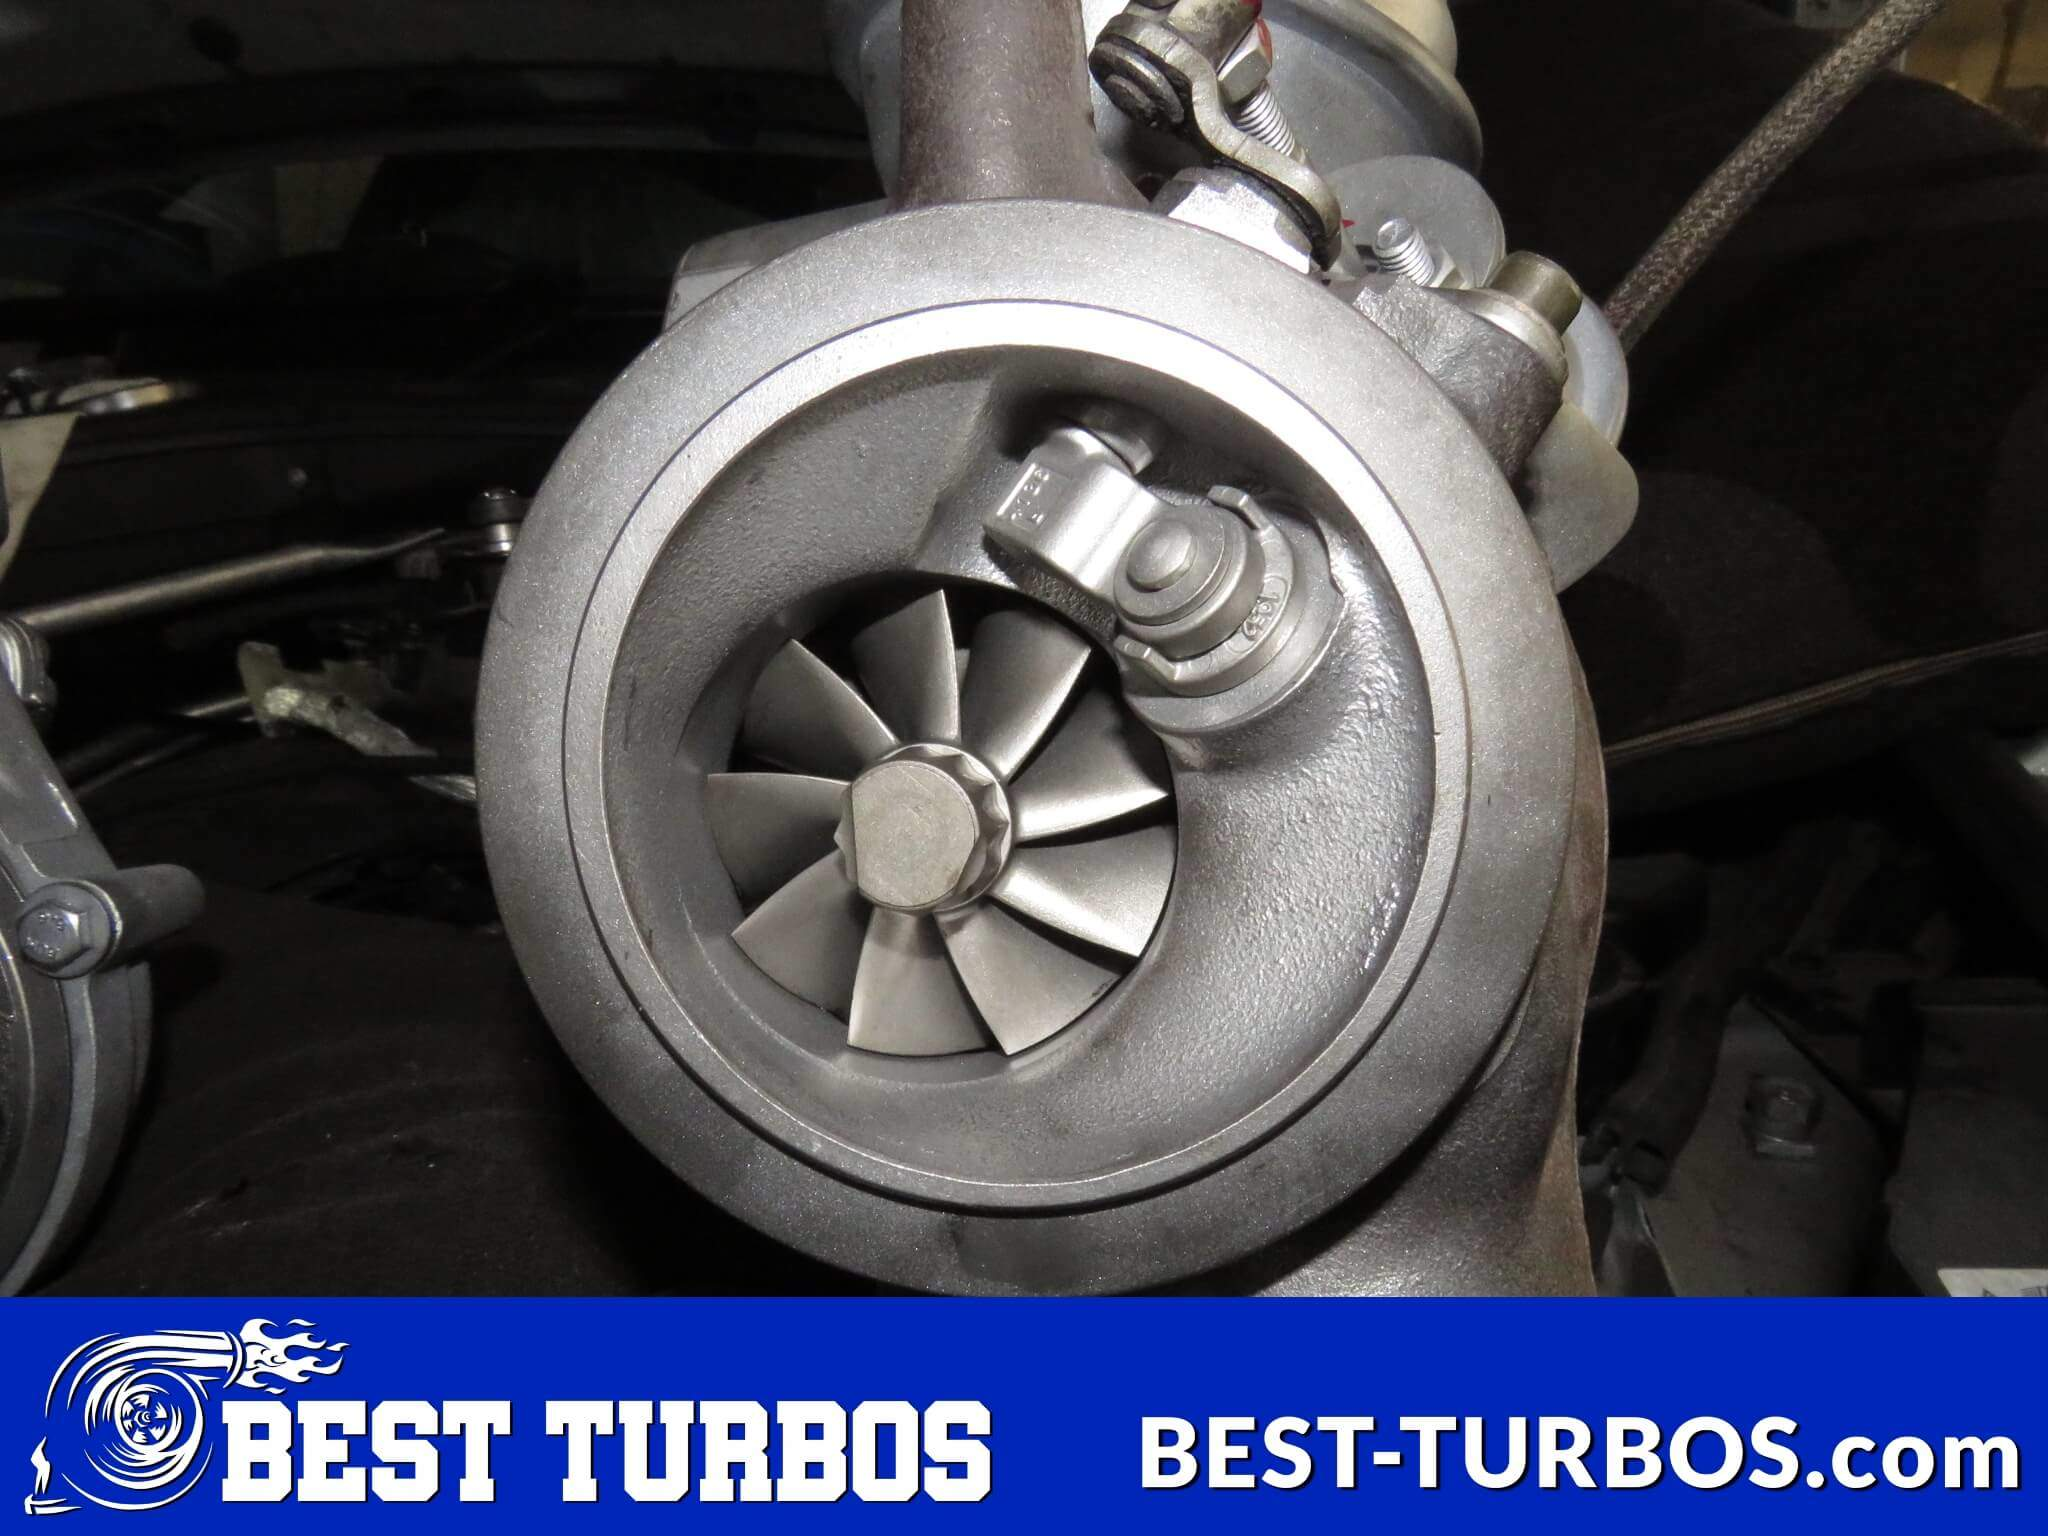 Turbo Reconditioning Turbo Repairs Turbo Fitting